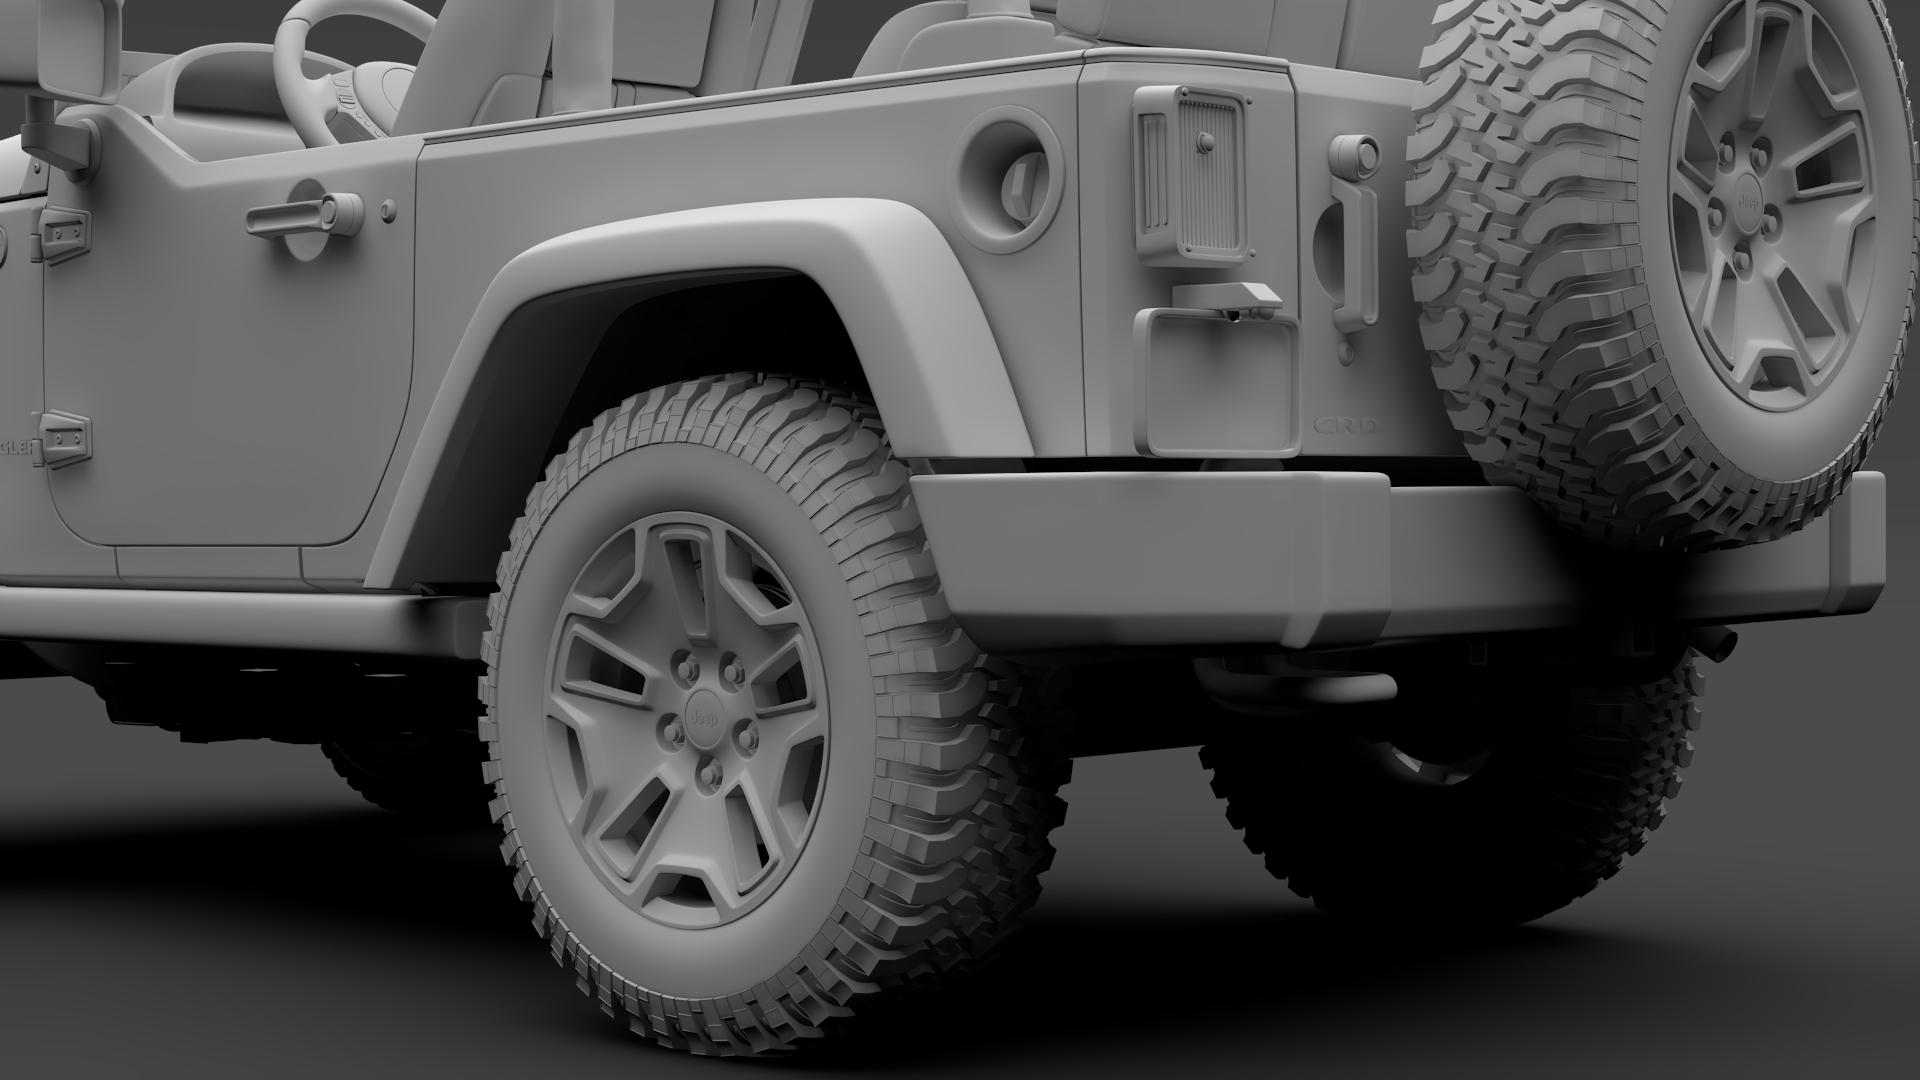 jeep wrangler willys wheeler jk 2017 3d model max fbx c4d lwo ma mb hrc xsi obj 276807